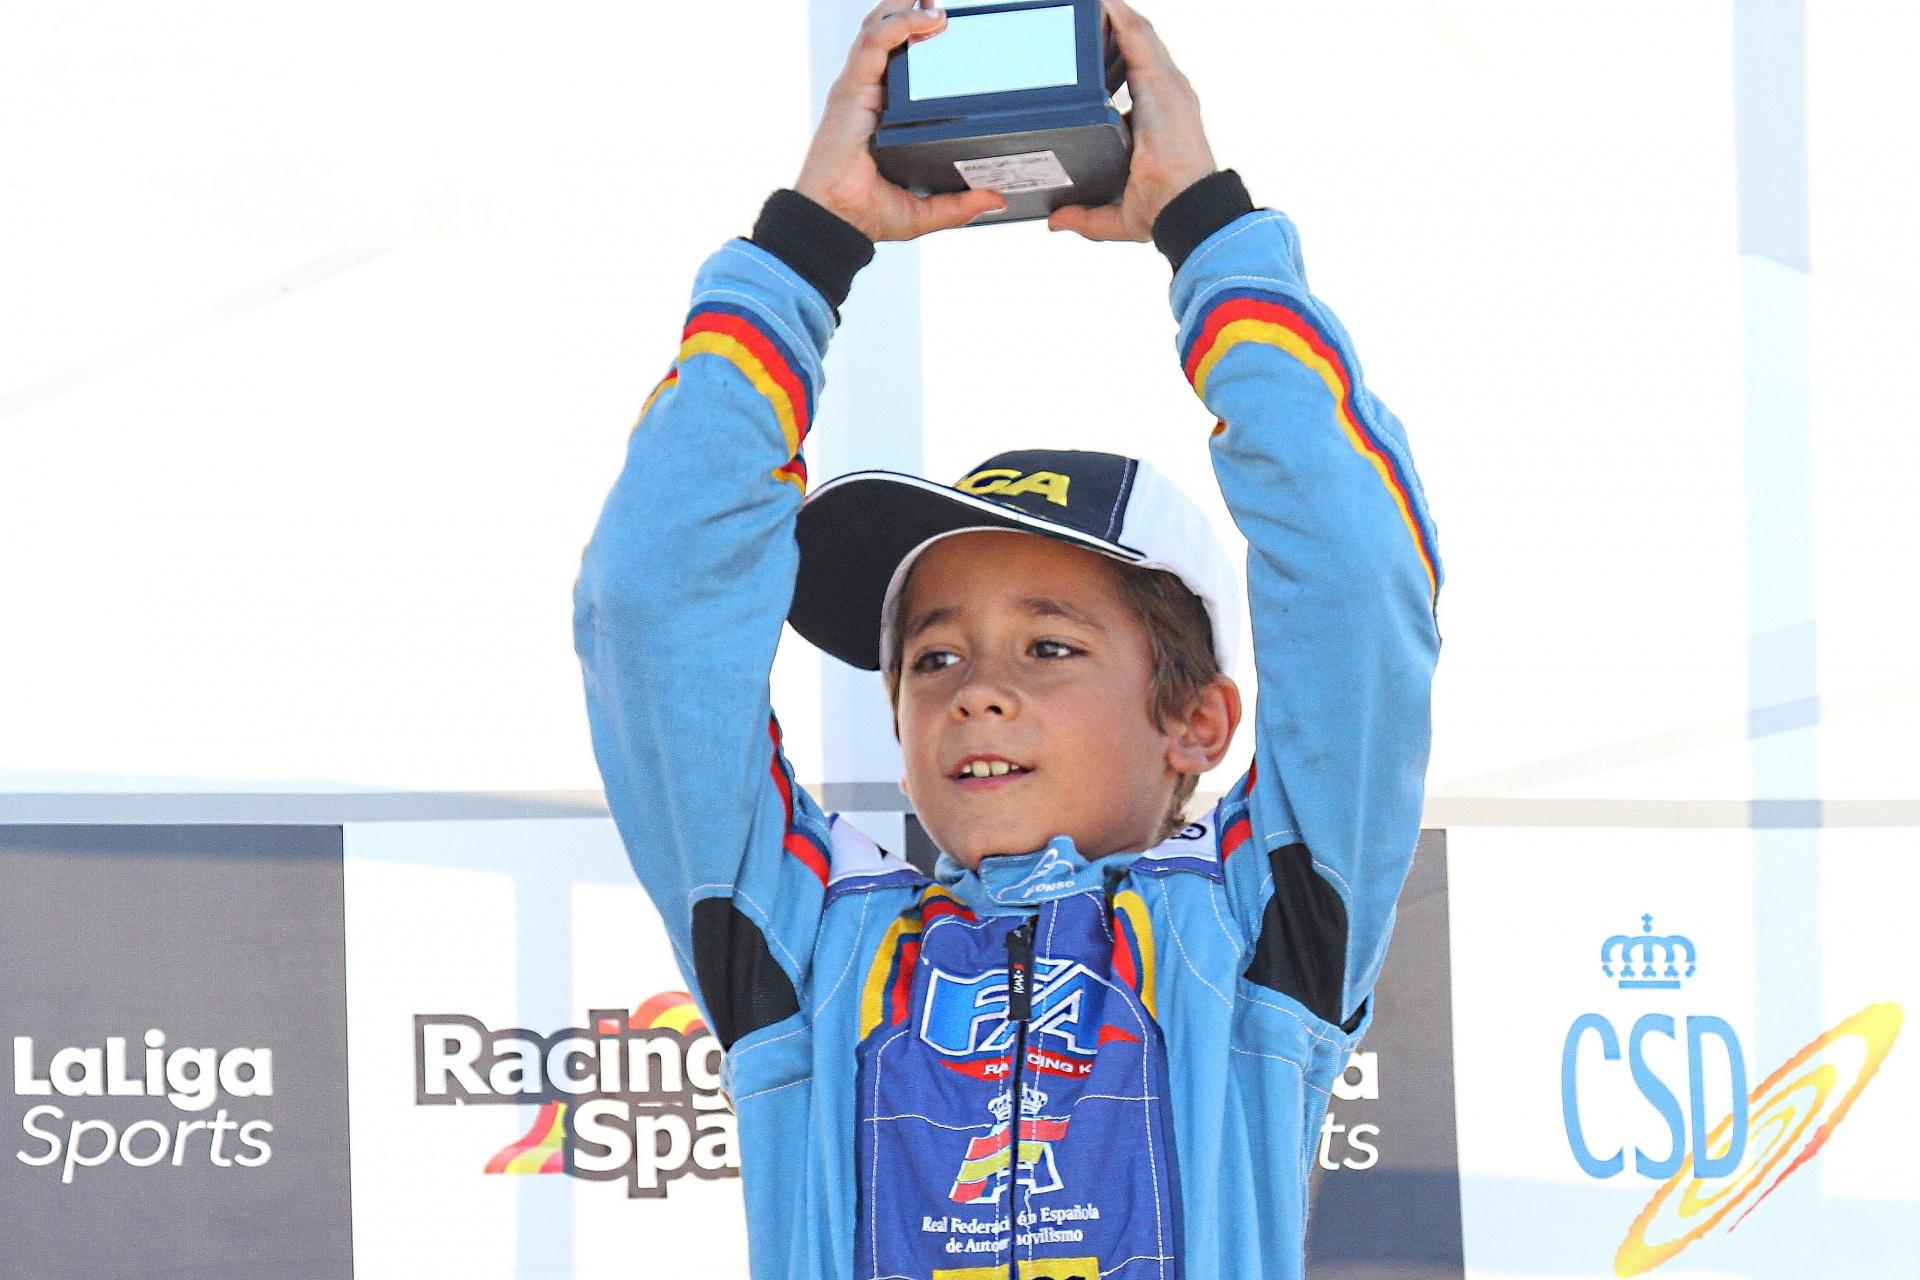 Álex Martínez - Campeón CEK Academy